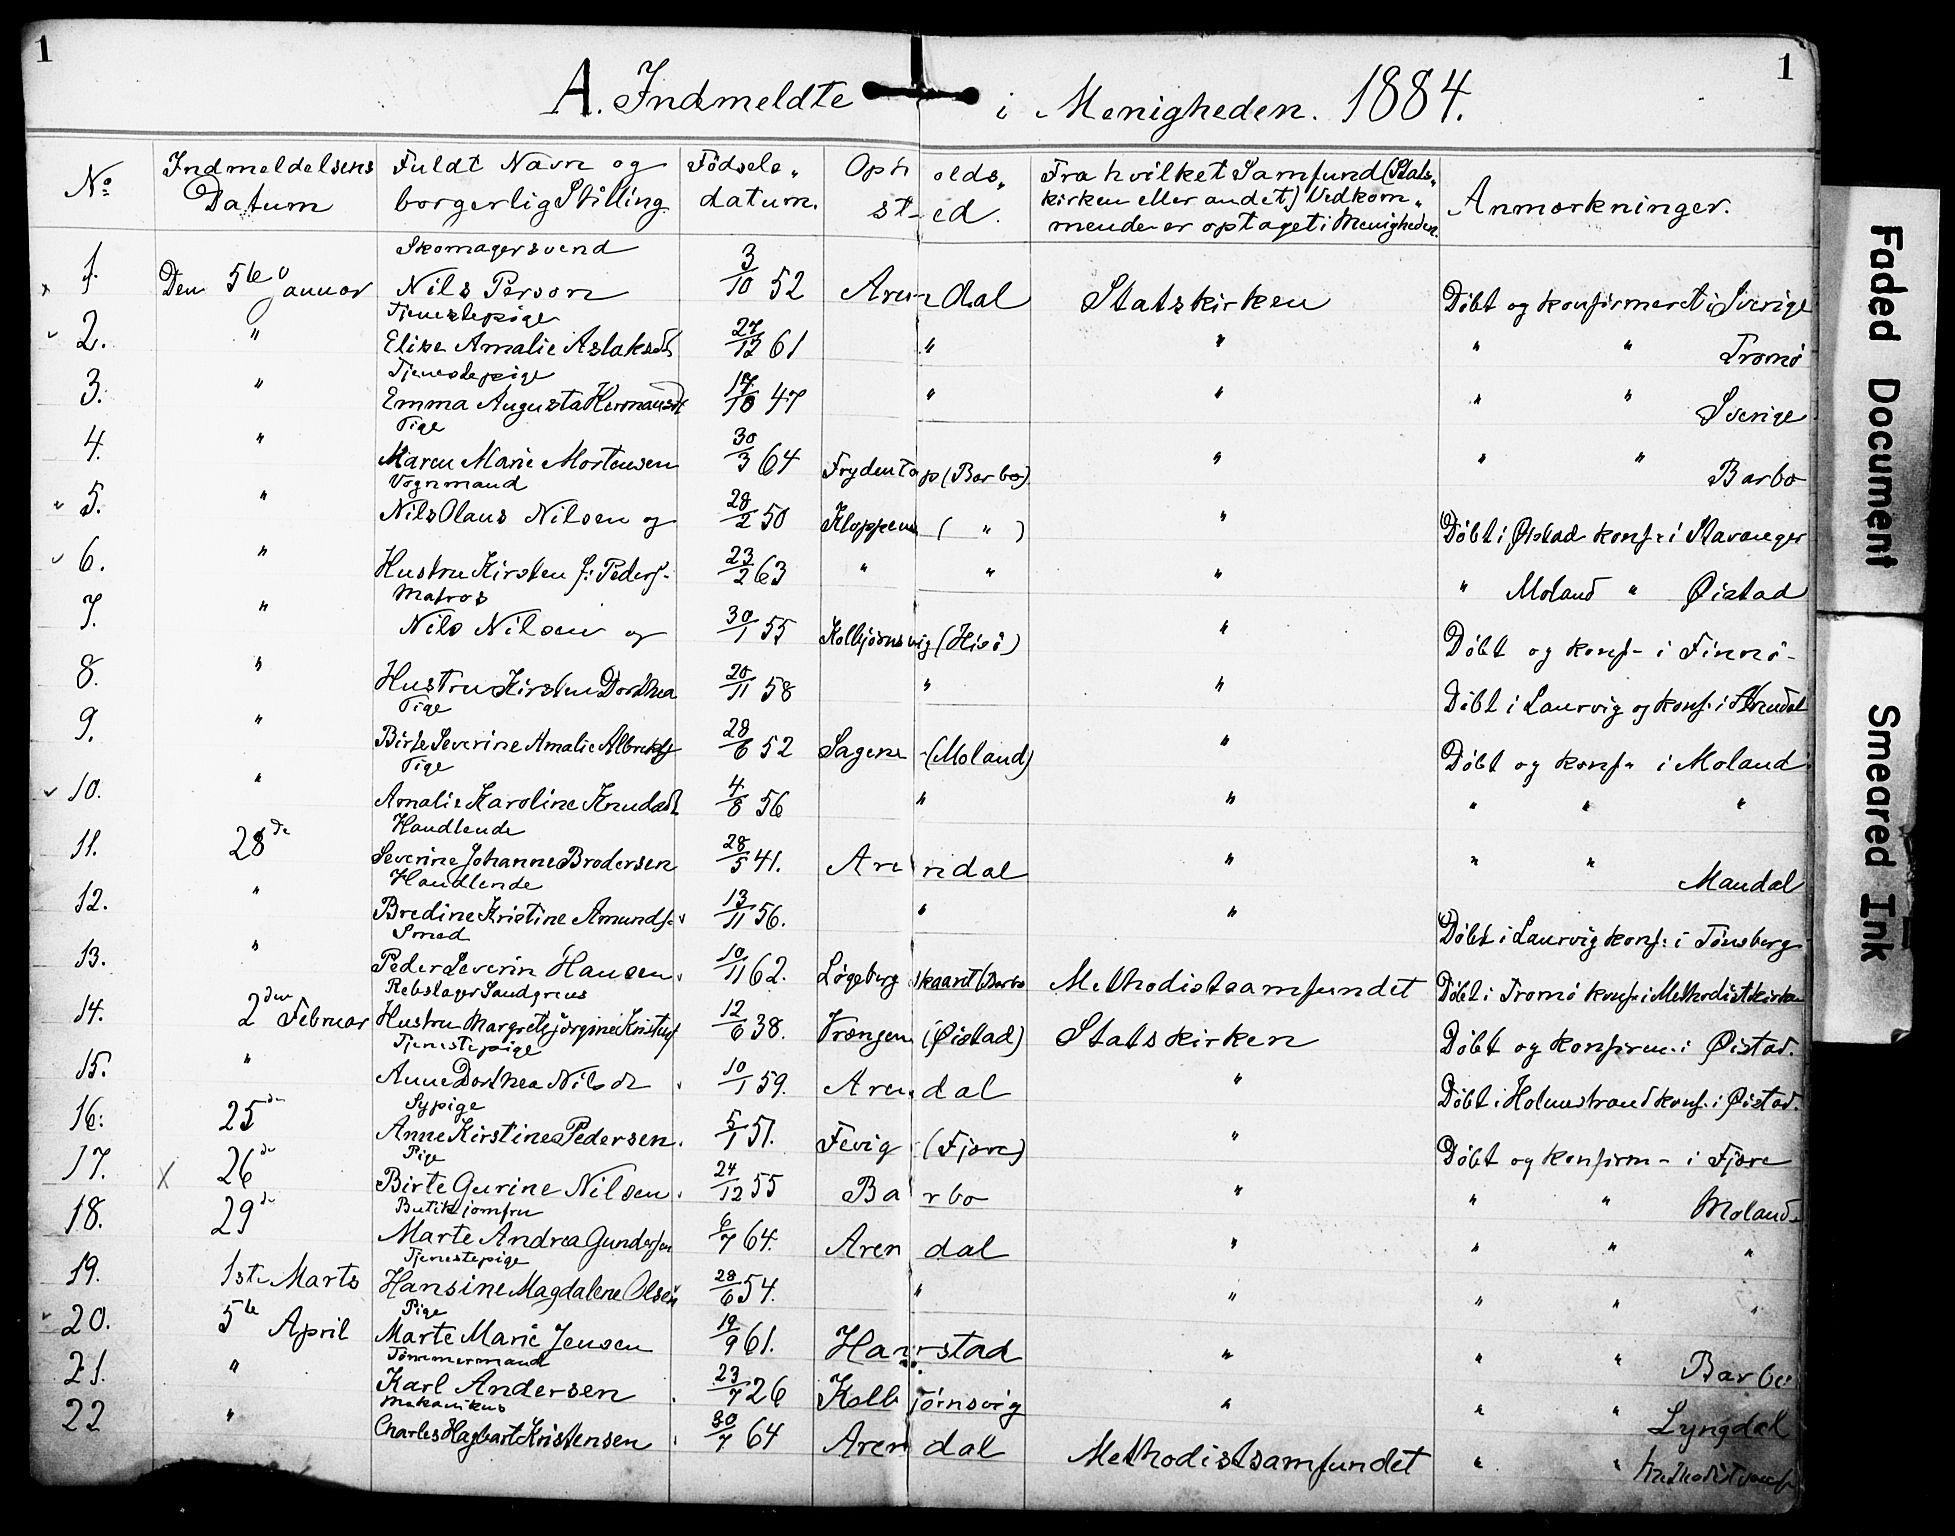 SAK, Den evangelisk-lutherske frimenighet, Arendal, F/Fa/L0002: Dissenterprotokoll nr. F 6, 1884-1908, s. 1